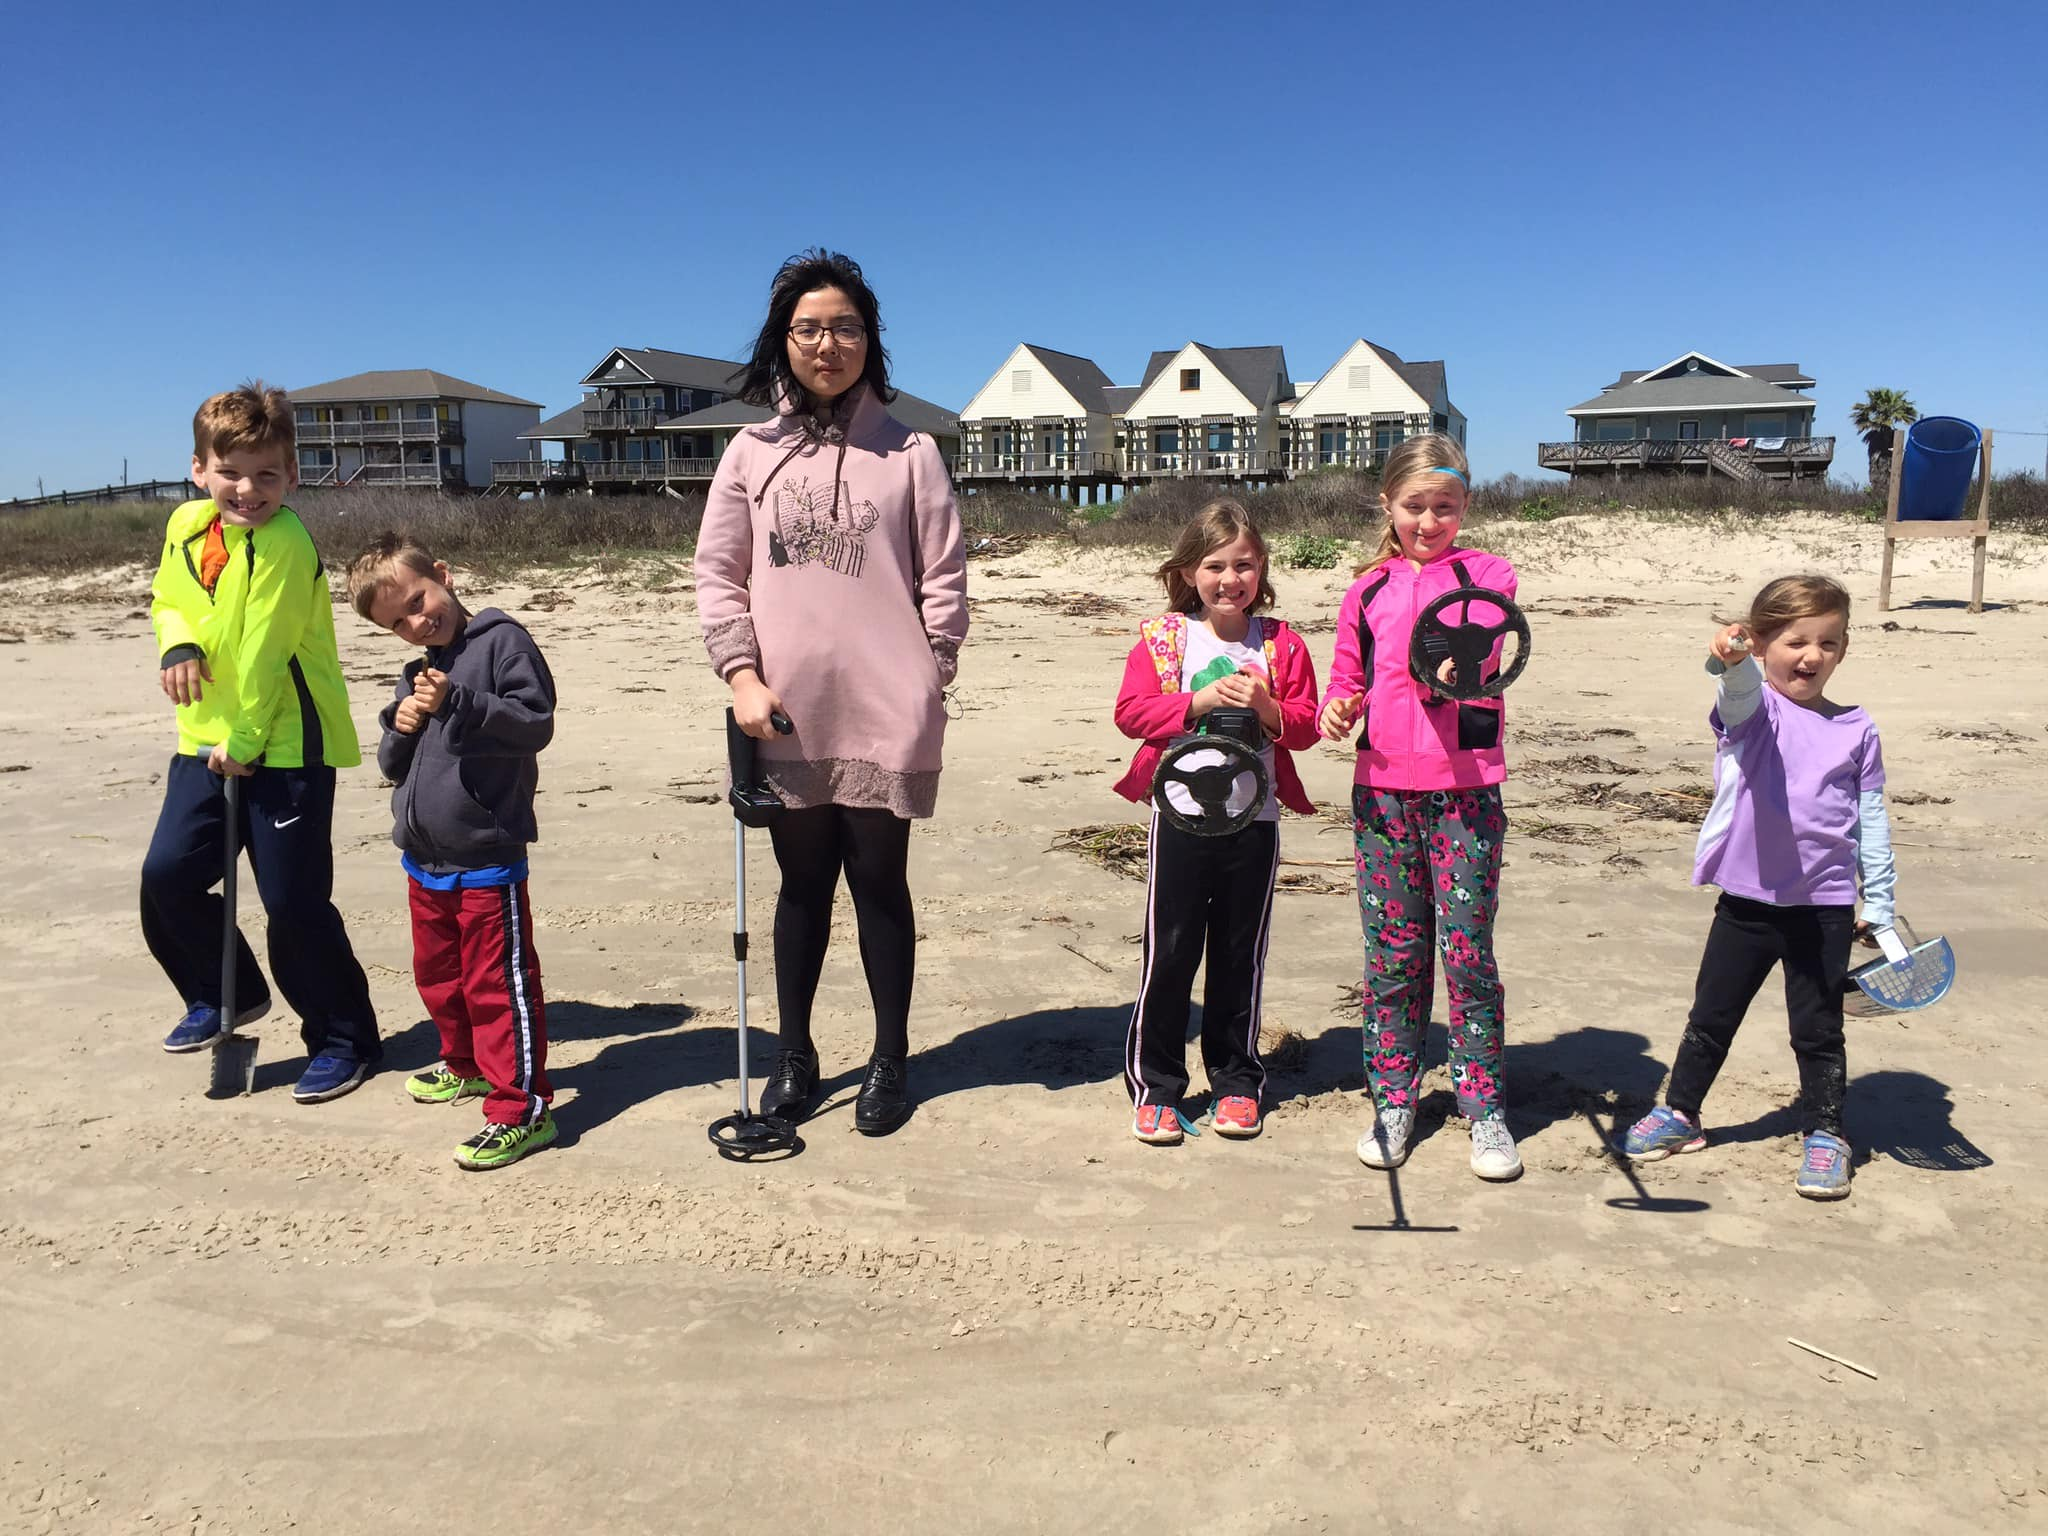 5 kids and Chinese girl at beach